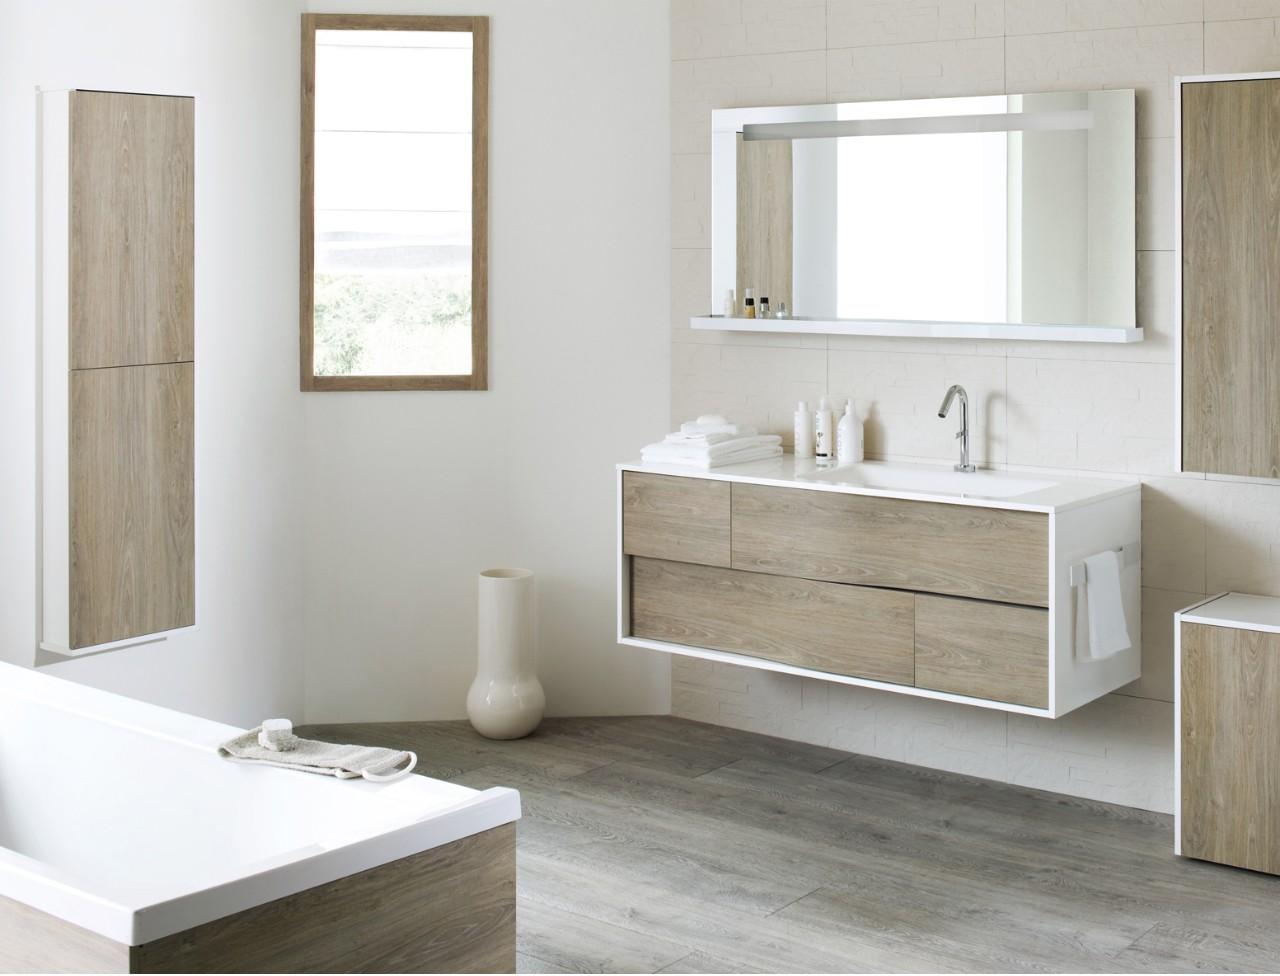 applique ikea salle de bain. Black Bedroom Furniture Sets. Home Design Ideas